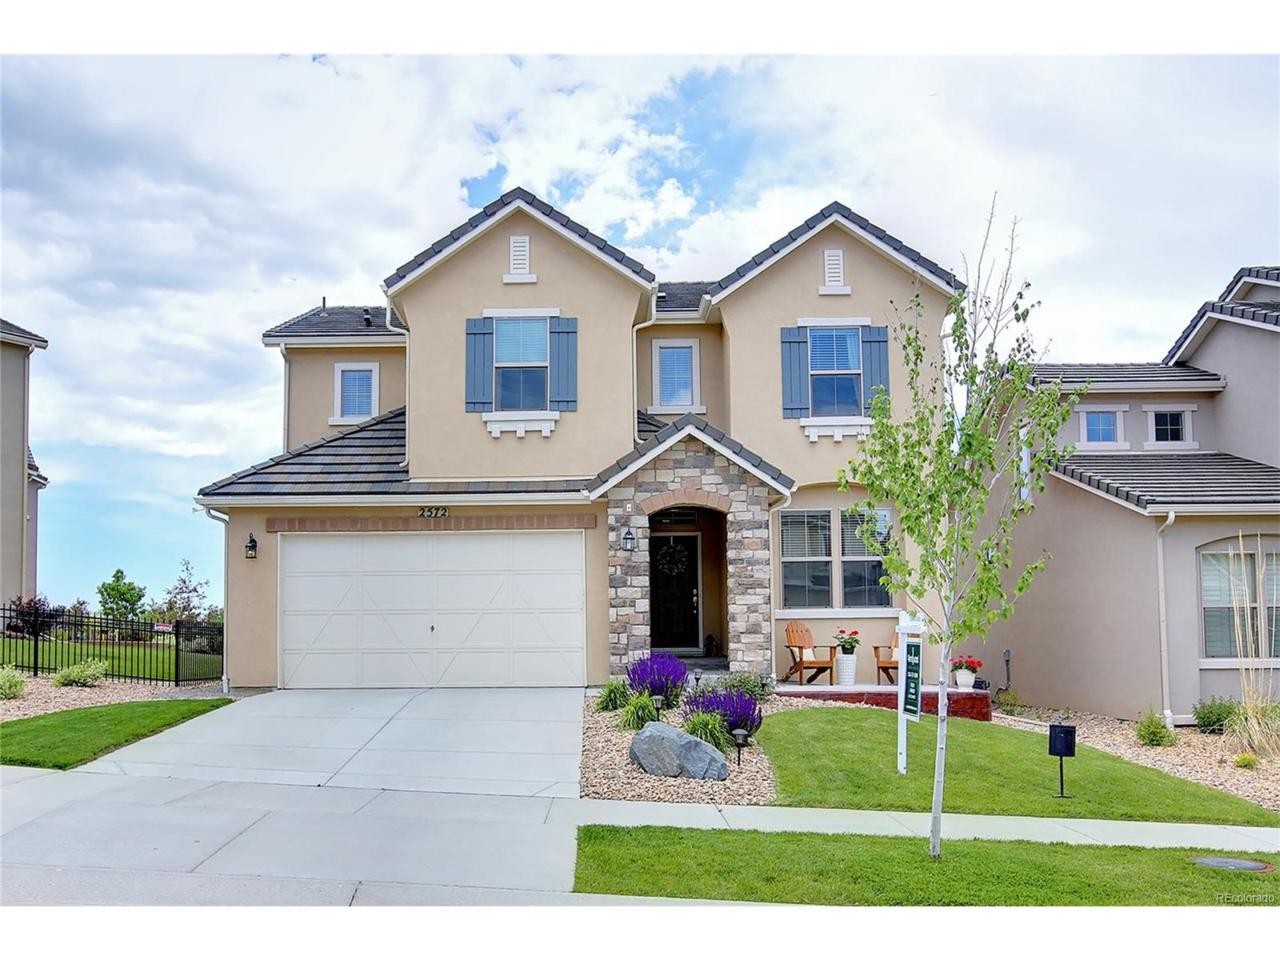 2572 S Kendrick Street, Lakewood, CO 80228 (MLS #3287744) :: 8z Real Estate